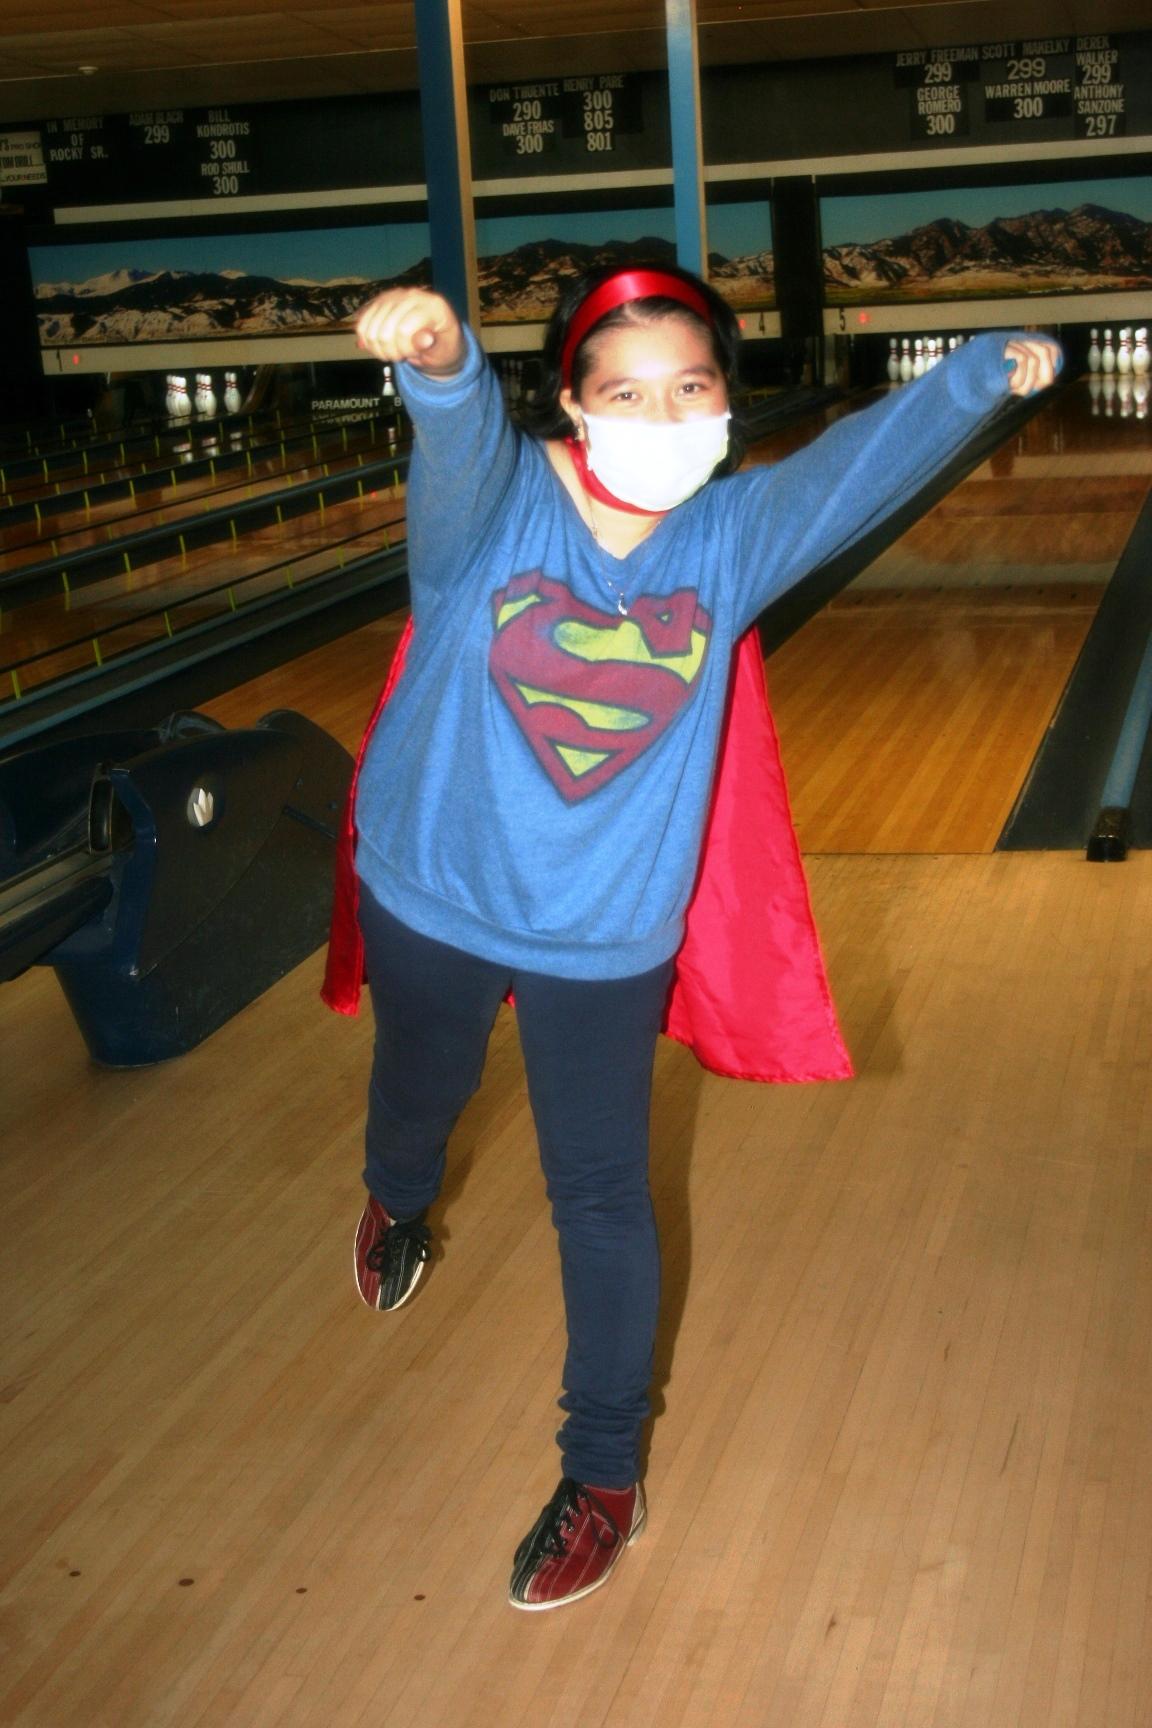 Bowling-2013 - 2013-10-27 16.30.31